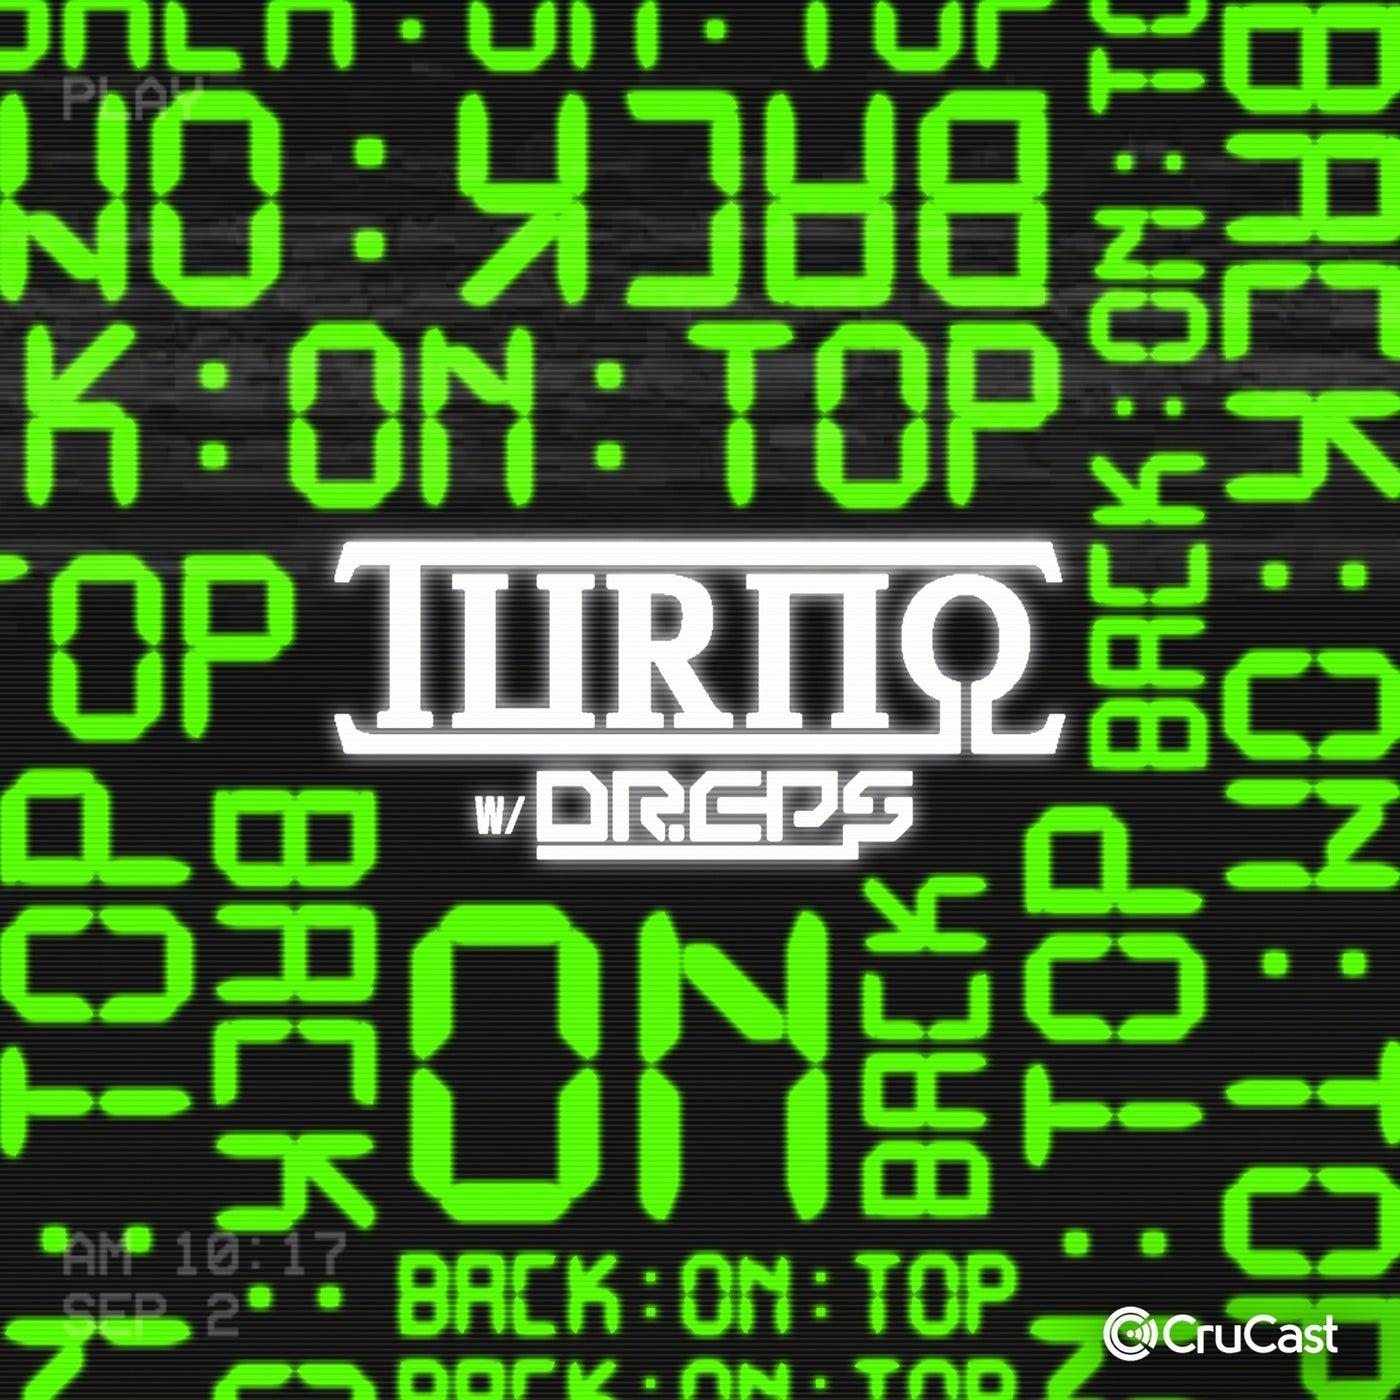 Back on Top (Original Mix)